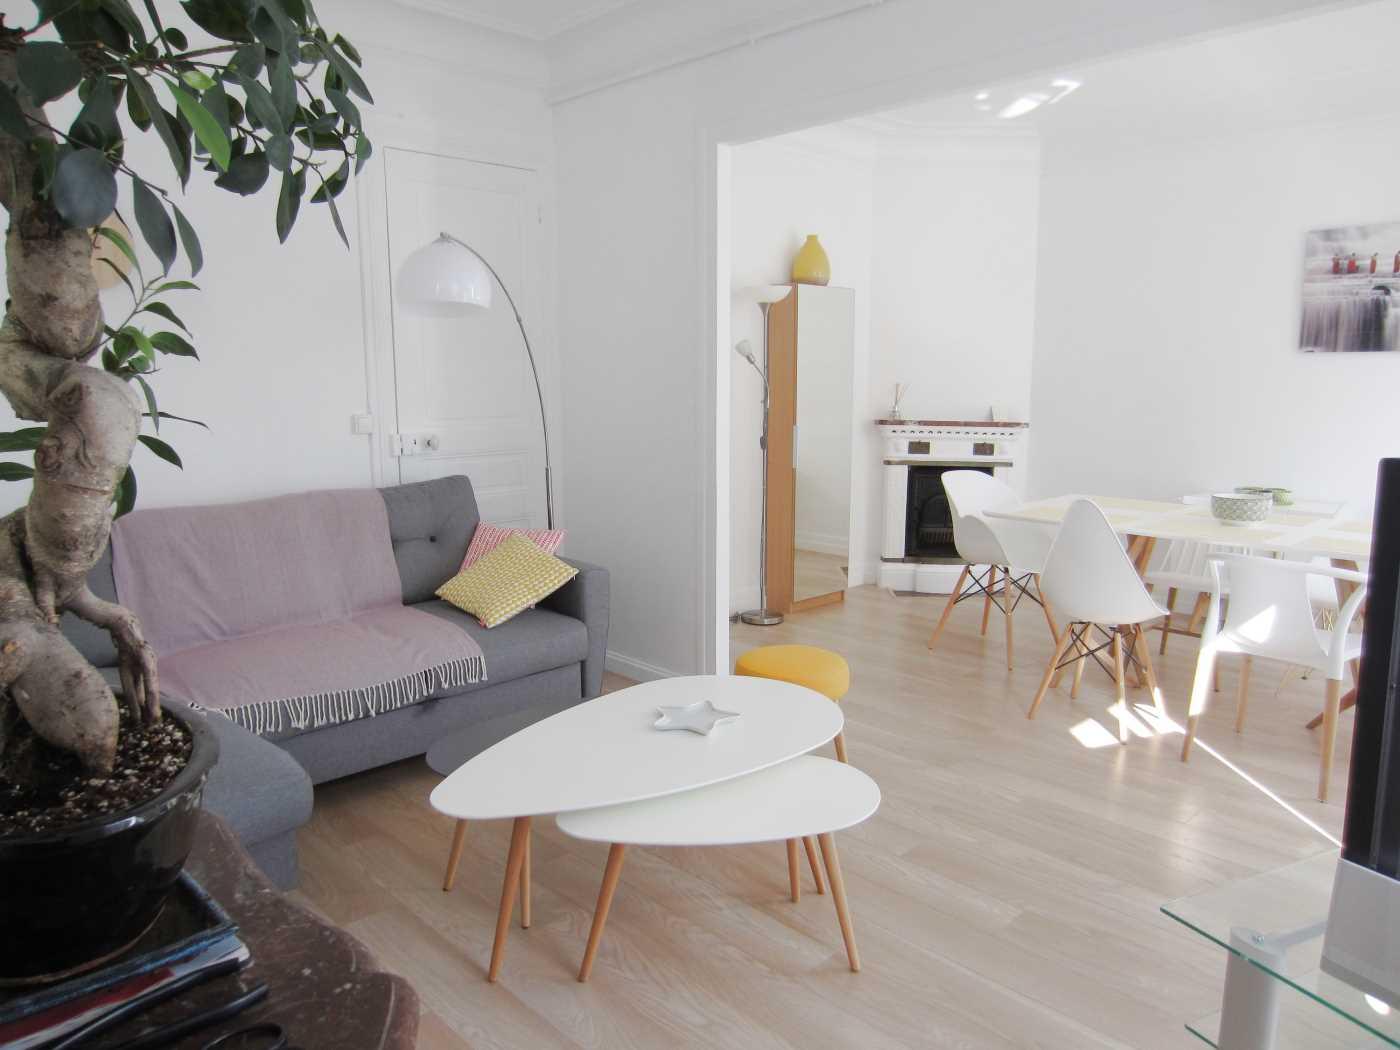 Location appartement meubl paris 15 cattalan johnson for Location appartement non meuble paris